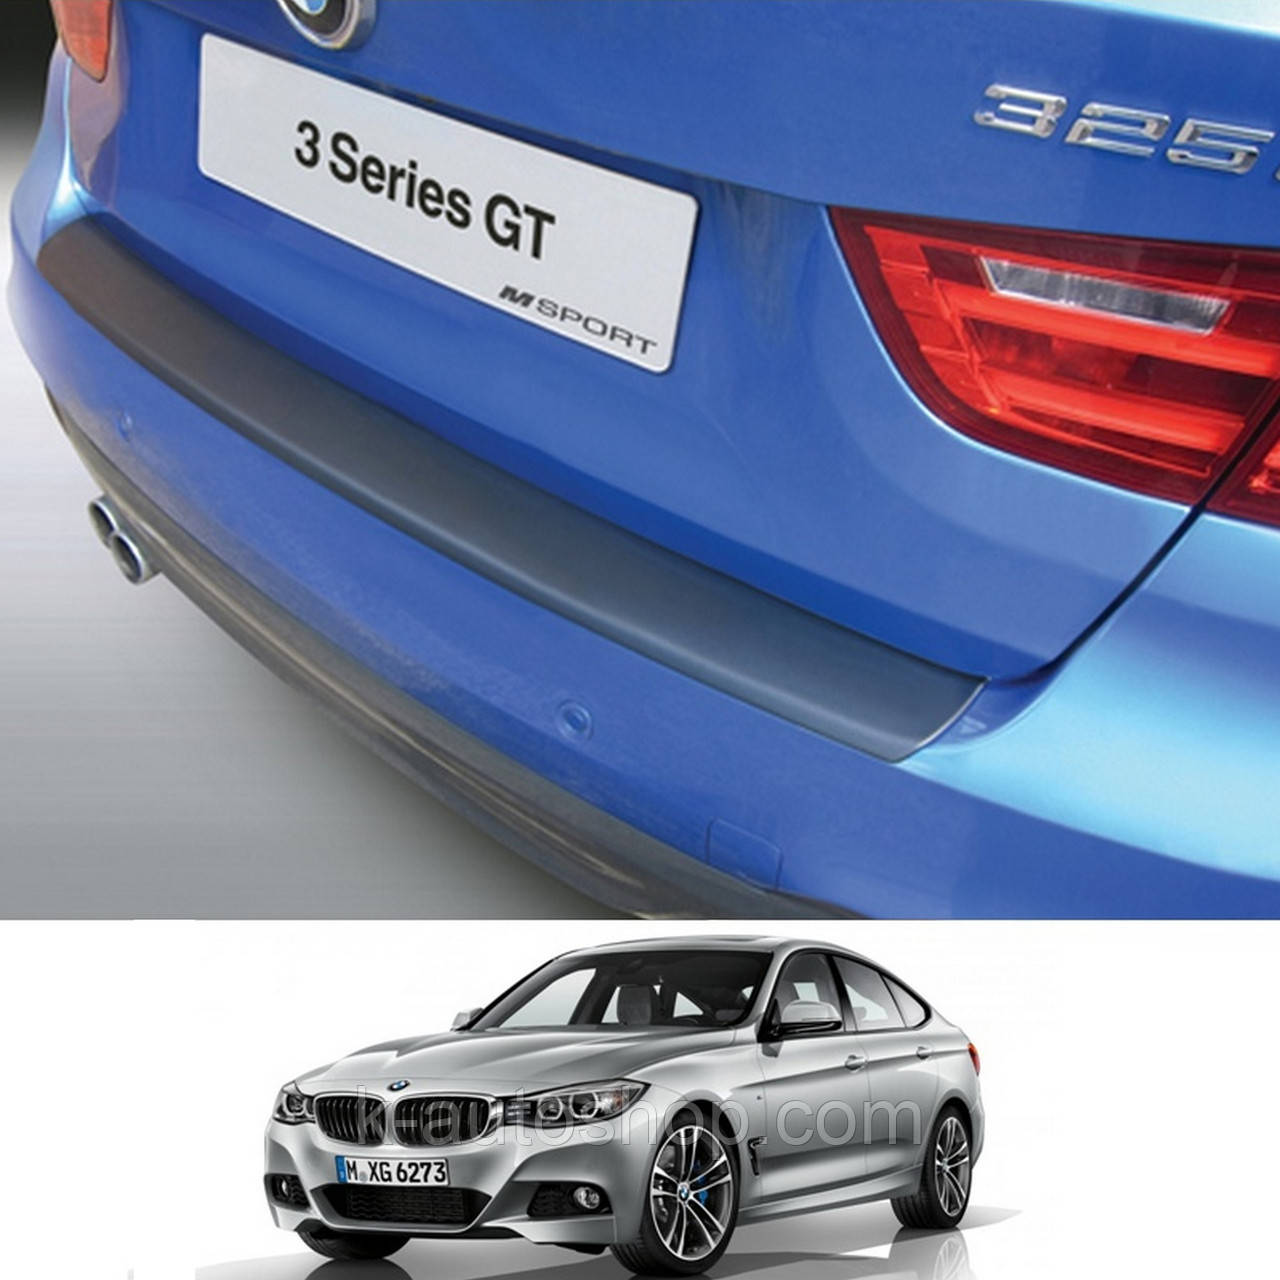 Пластиковая защитная накладка на задний бампер для BMW 3-series F34 GT 2013+